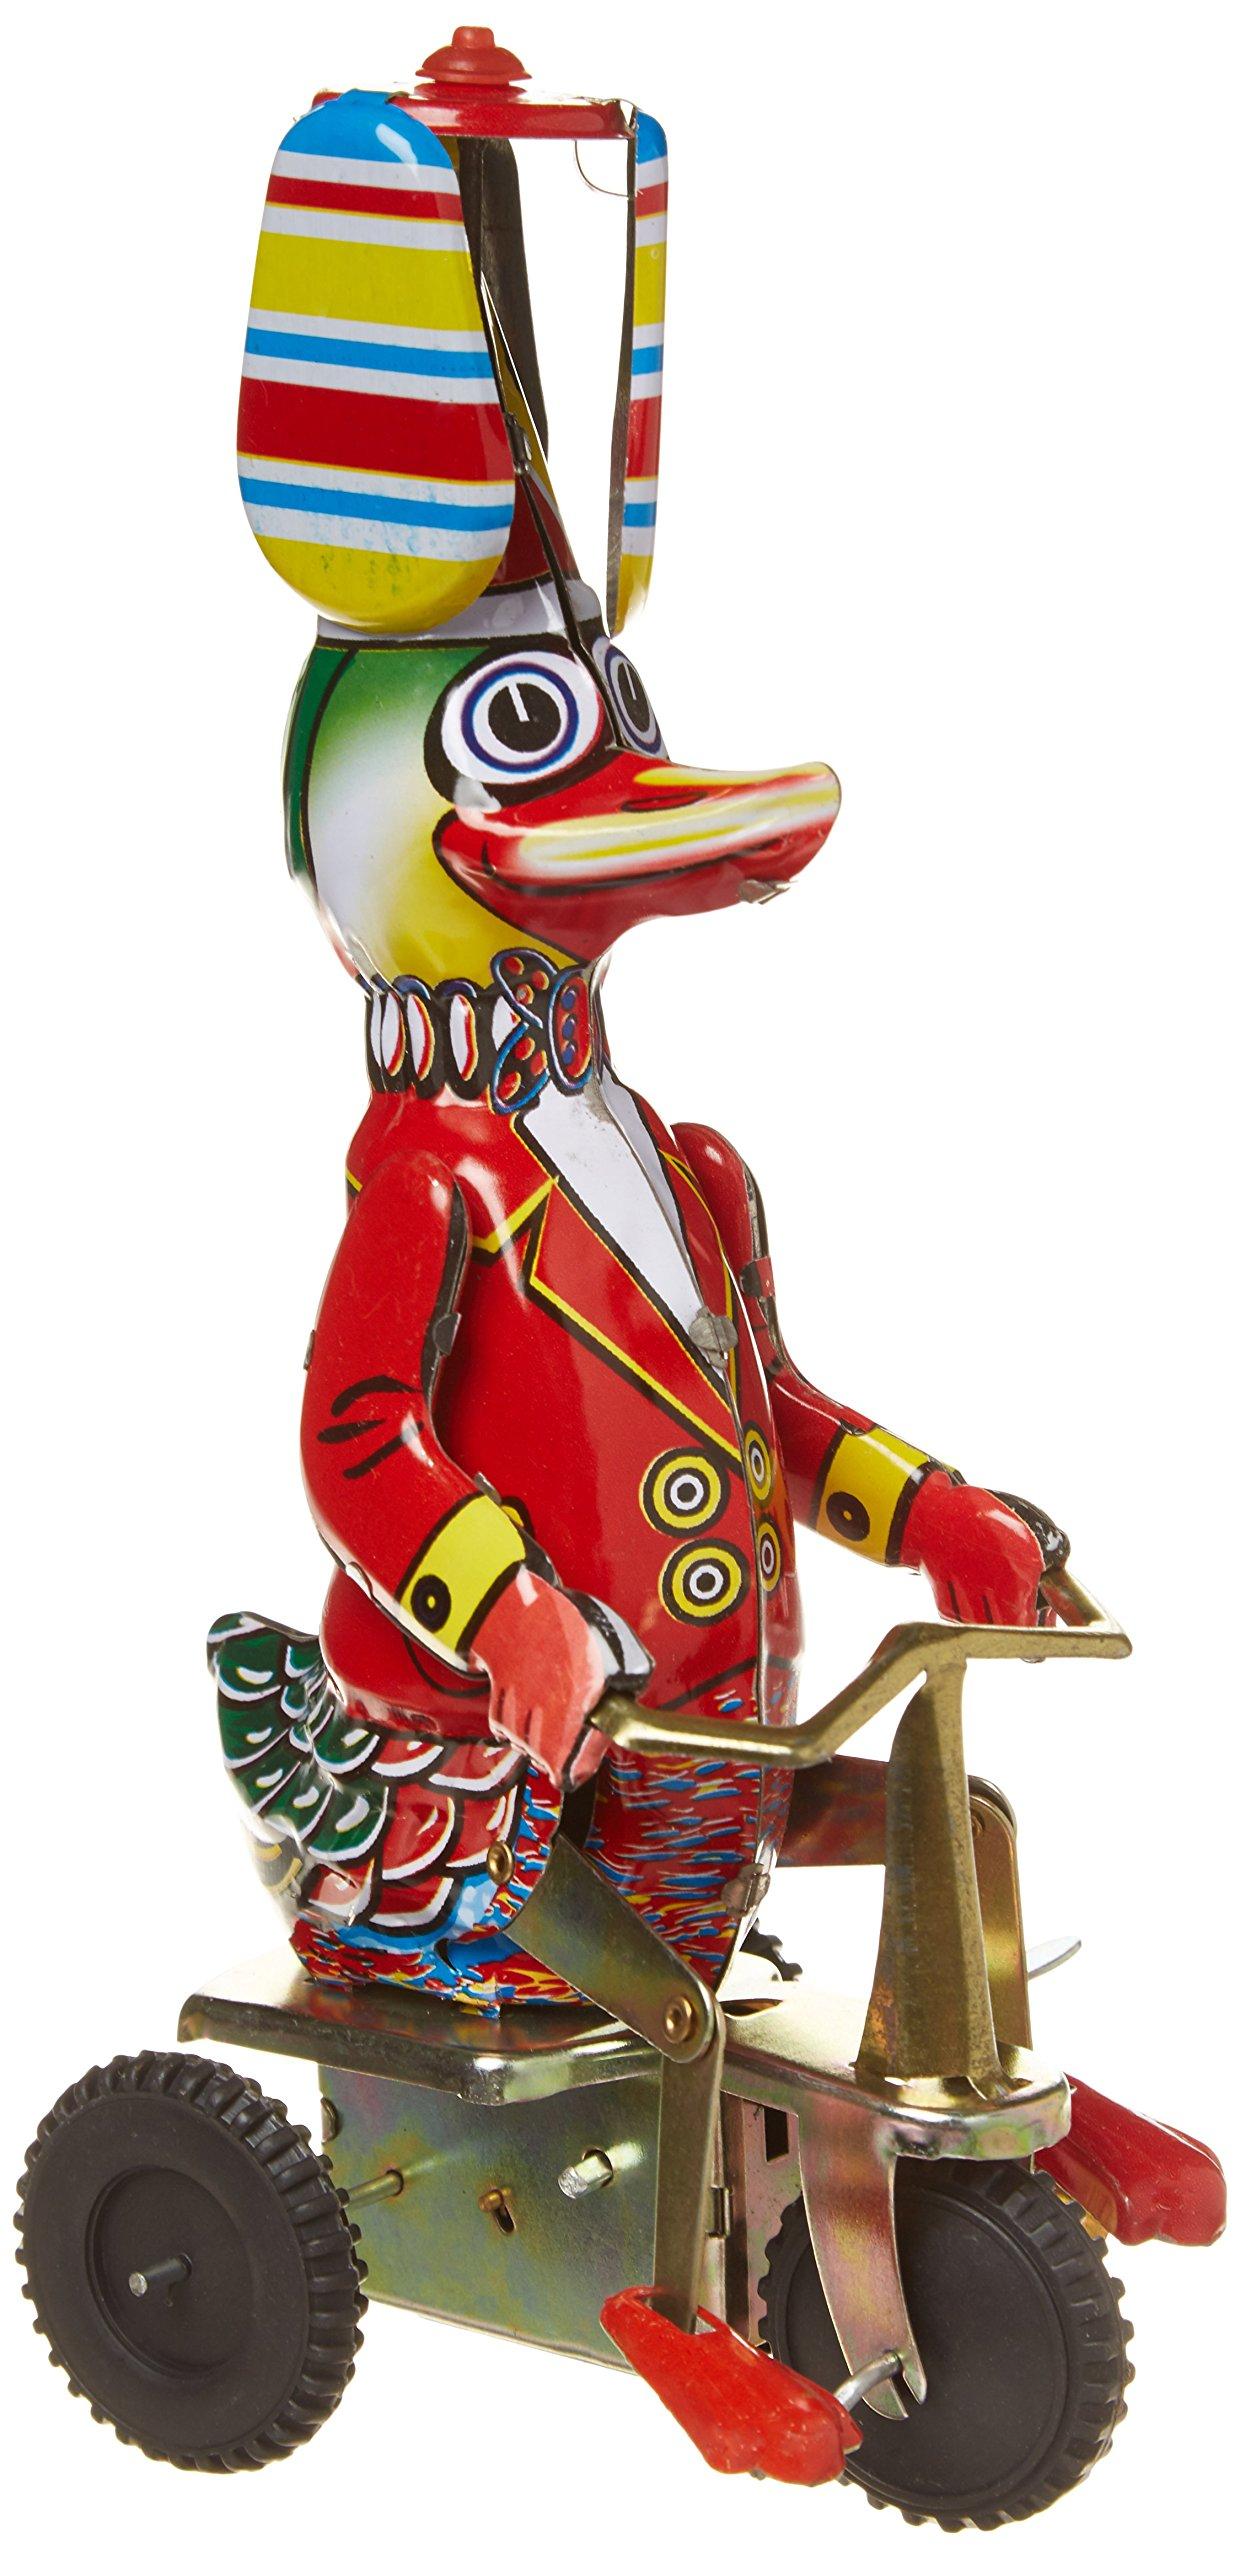 Schylling Wind-Up Duck on Bike